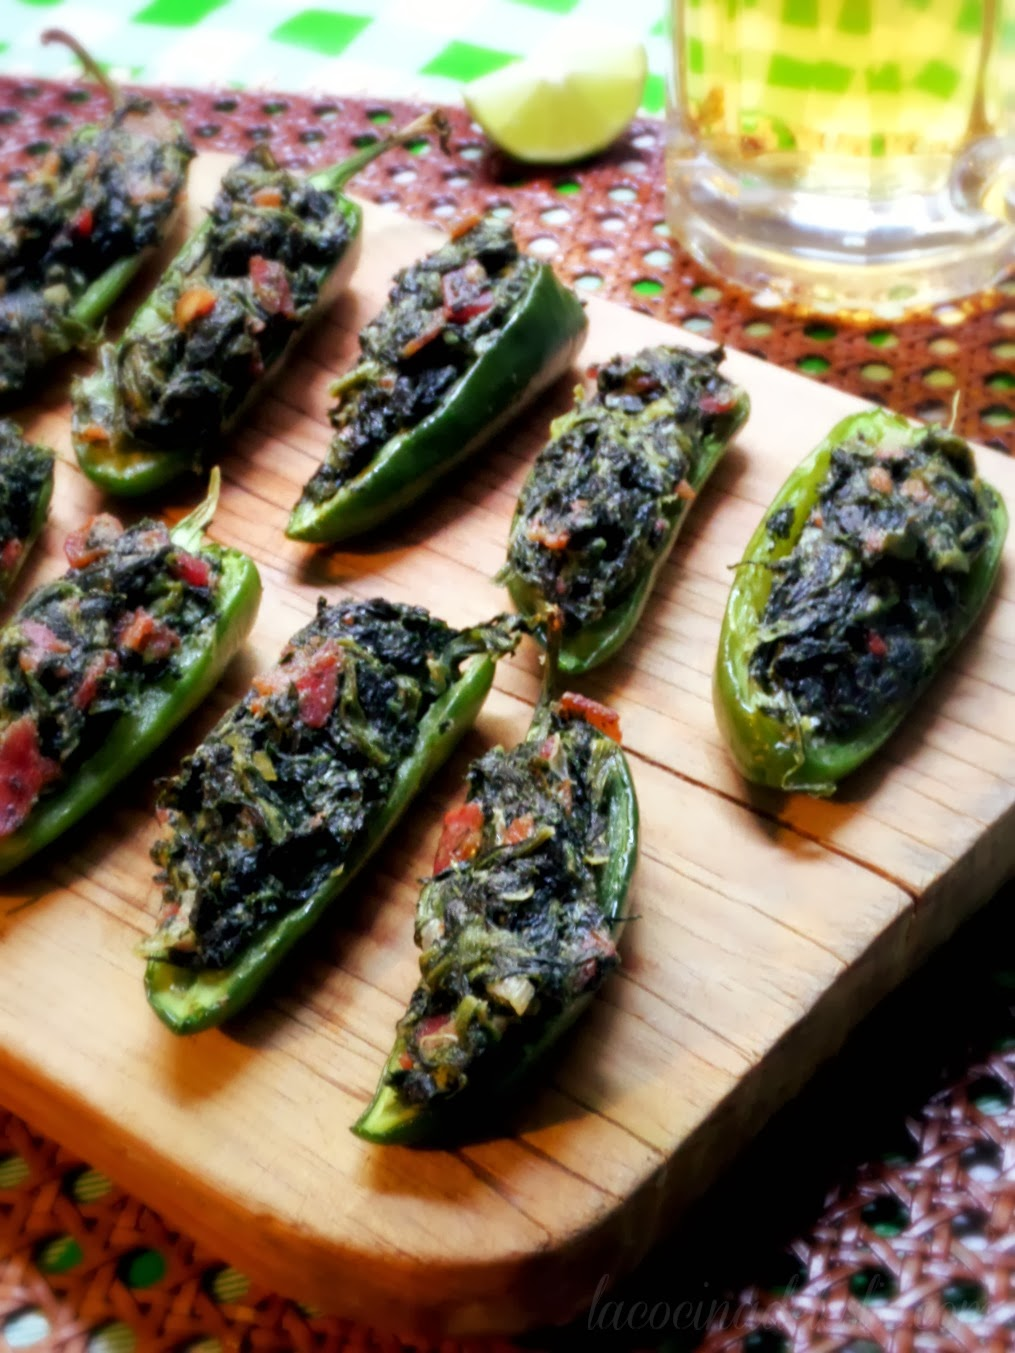 Spinach Stuffed Jalapeño Poppers - lacocinadeleslie.com